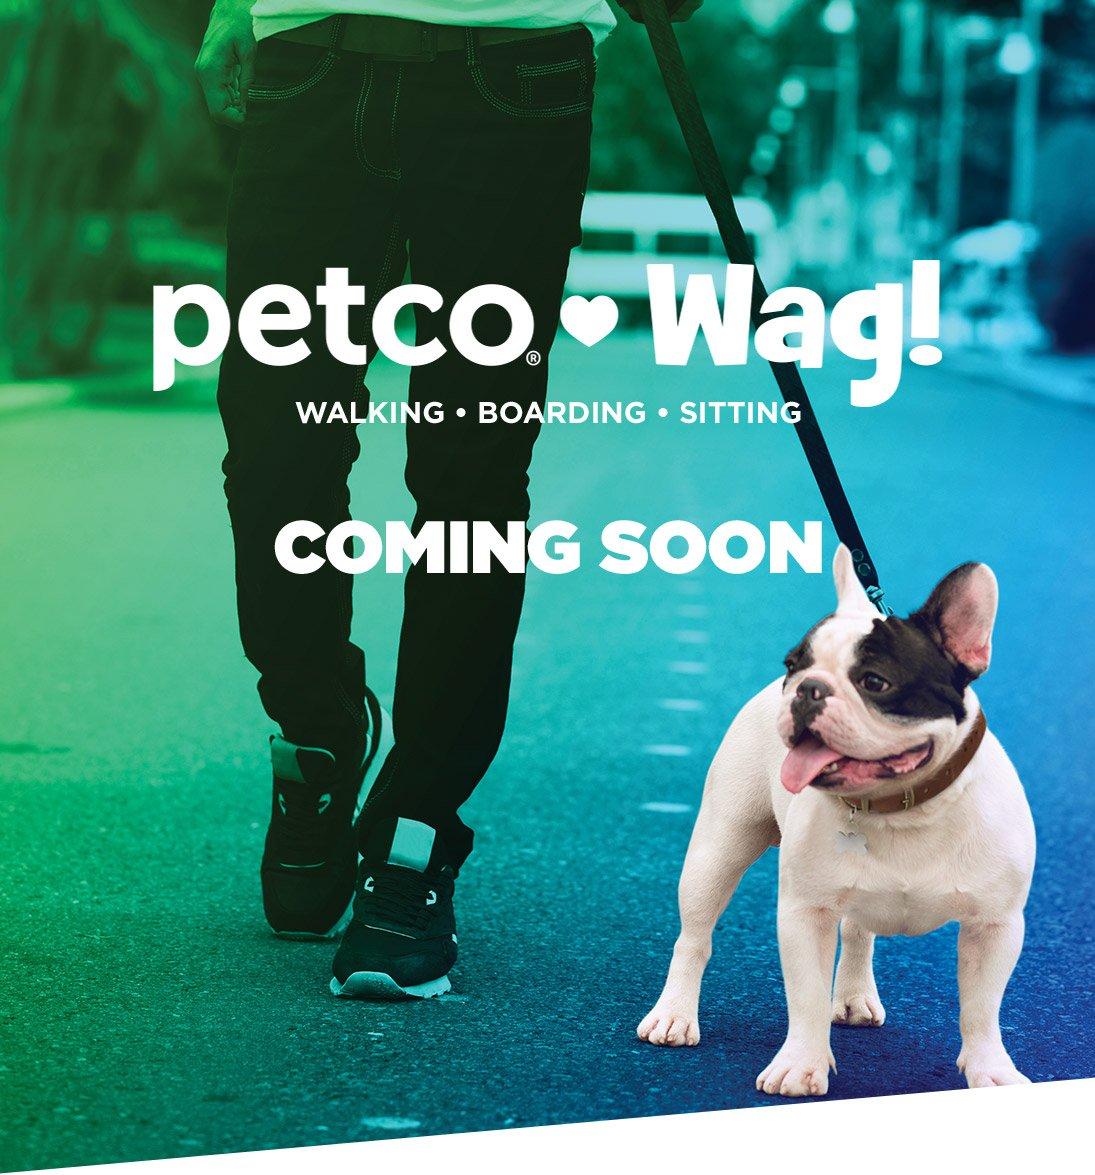 Petco Wag - Walking Boarding Sitting - Coming Soon